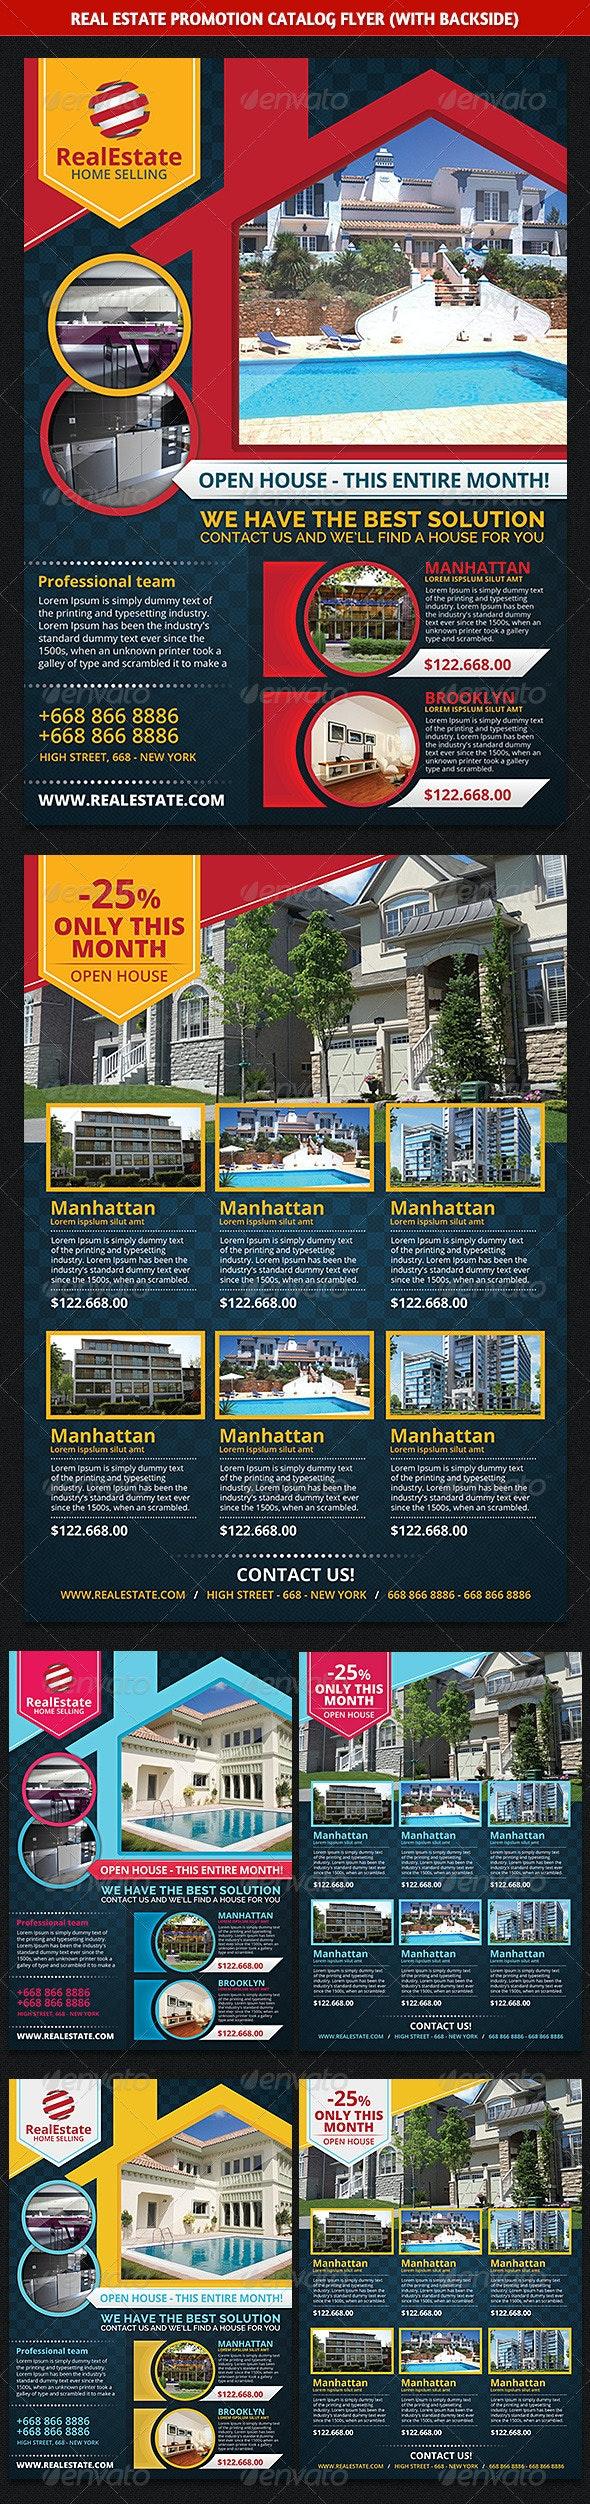 Real Estate Promotion Catalog Flyer - Commerce Flyers